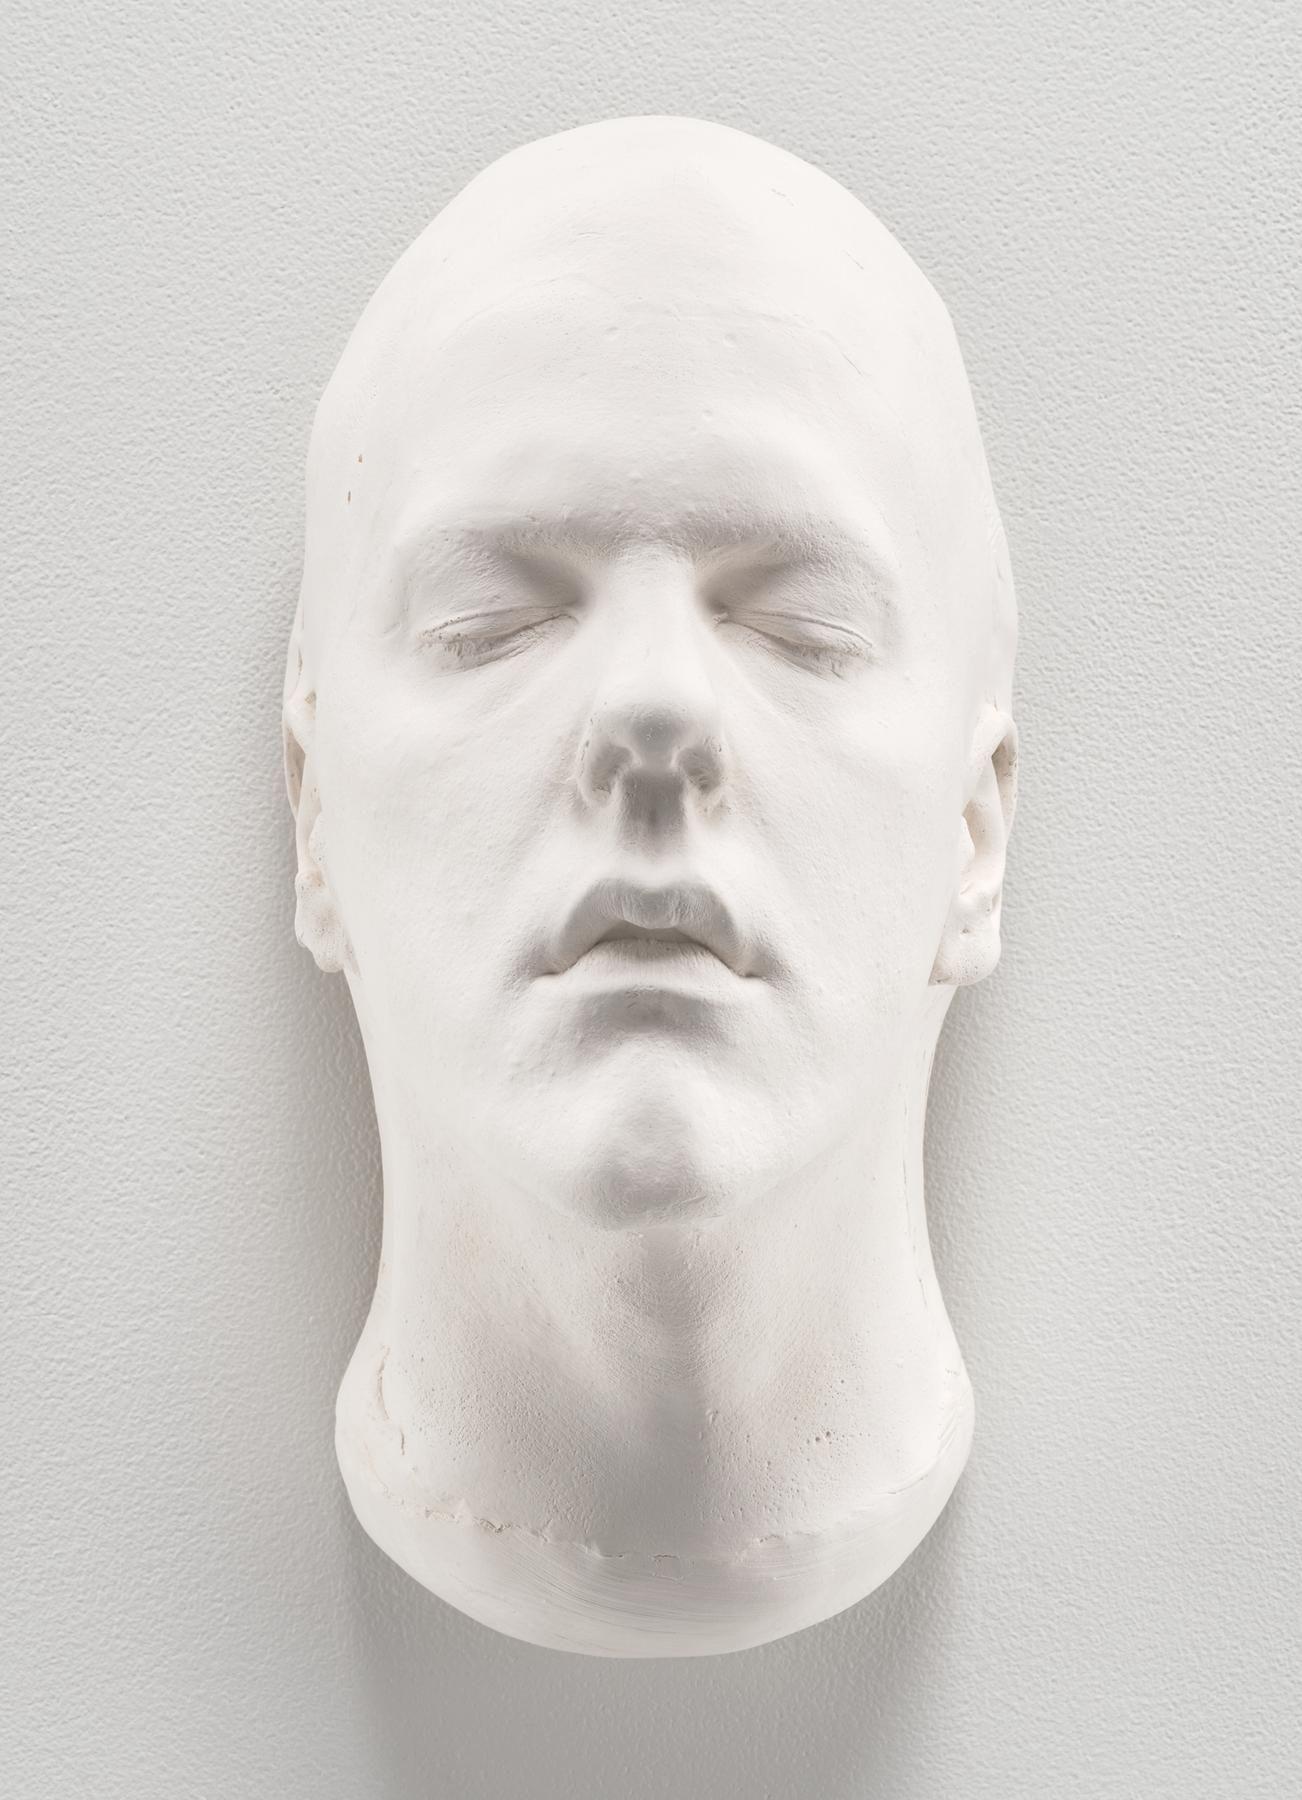 Edmier imagines (Kiefer Sutherland, Actor)